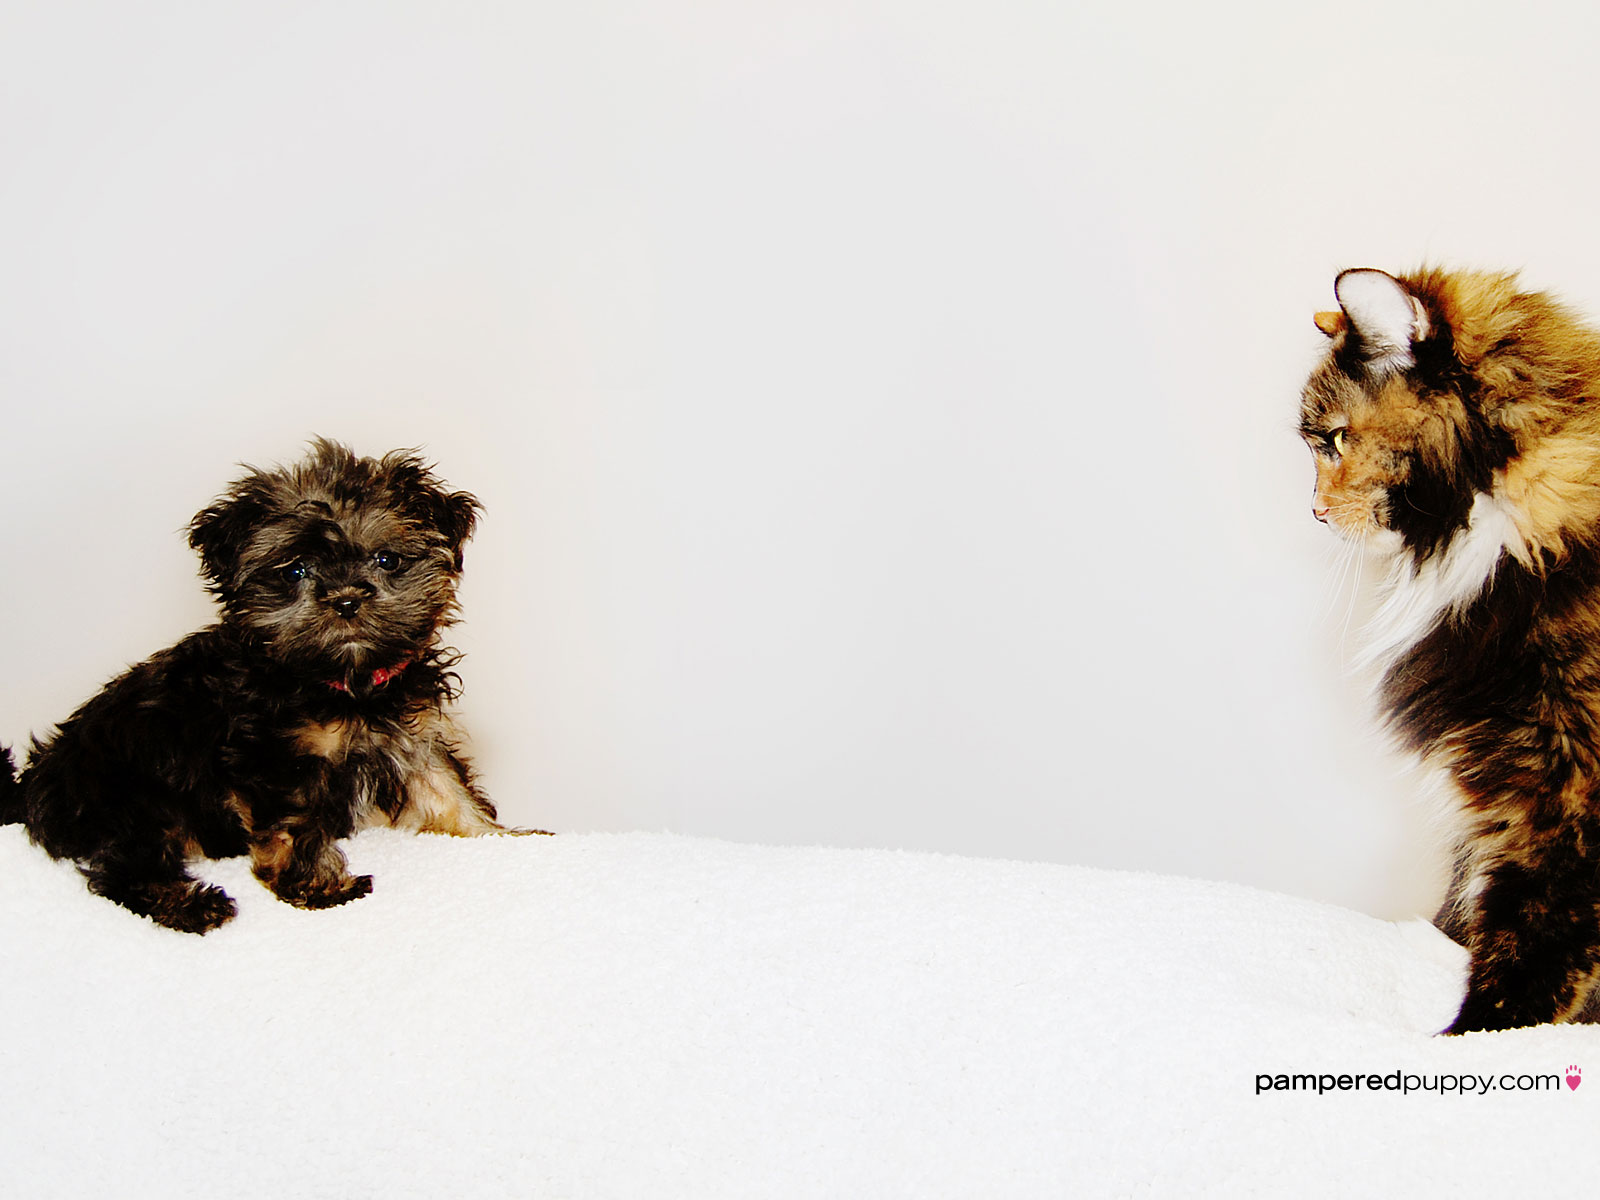 dog wallpaper   The staredown tiny Shih TzuYorkie puppy and 1600x1200